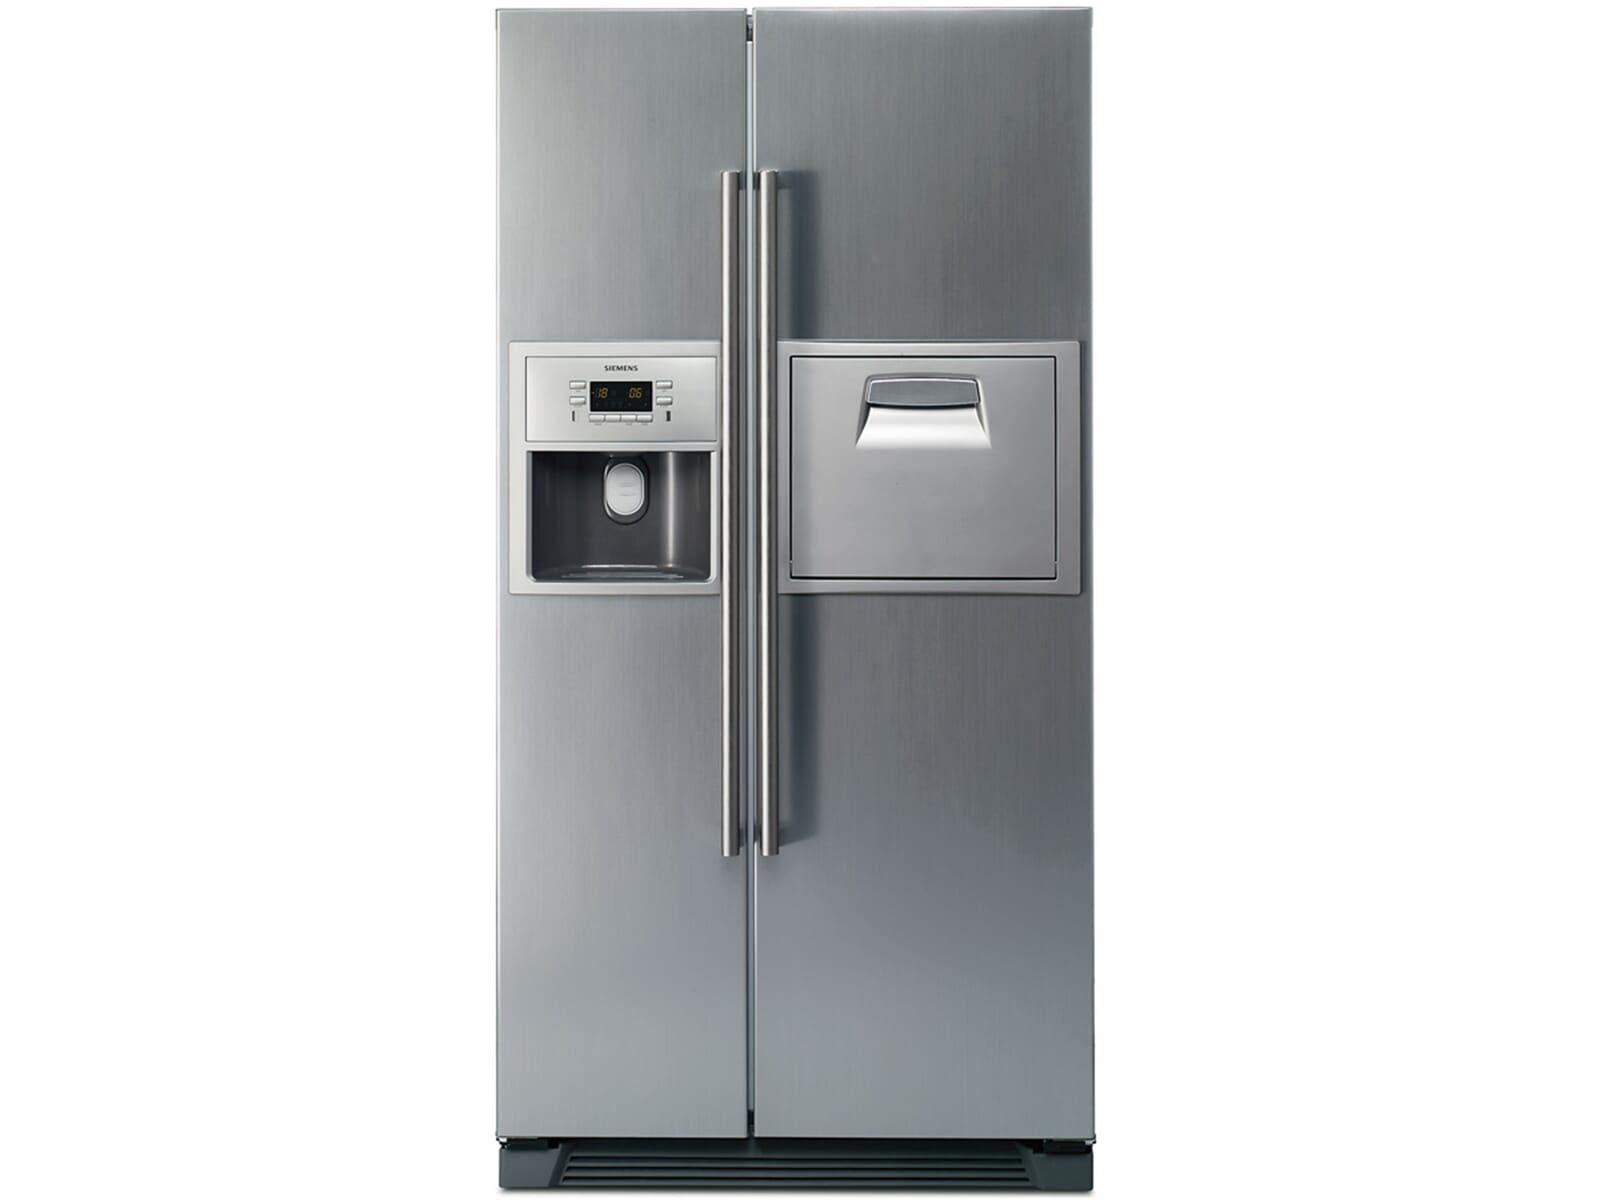 Amica Kühlschrank Retro Test : Amica retro kühlschrank erfahrung: kühlschrank amica bewertung